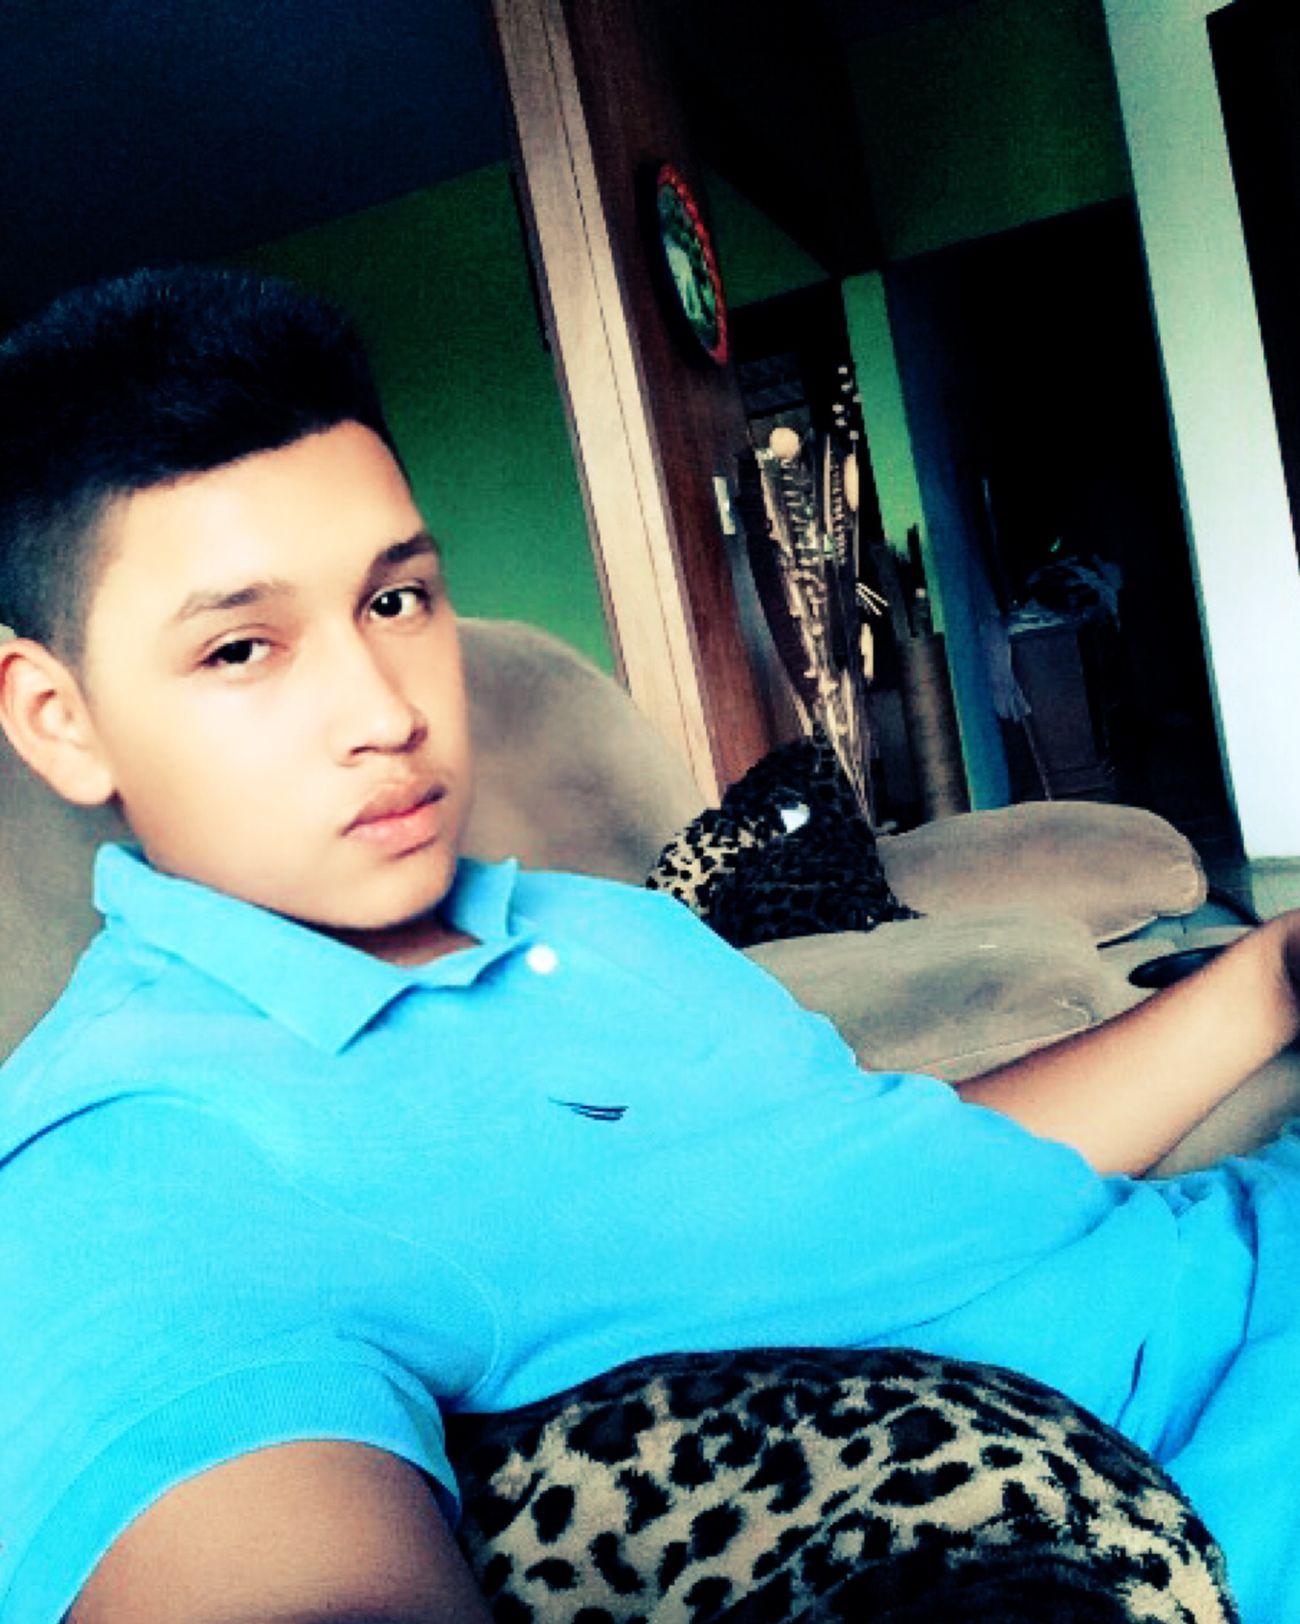 Hipster Happy :) Followme That's Me WilverGomez Handsome Boy Today's Hot Look Handsome😍 Selfie ✌ Iphone5s